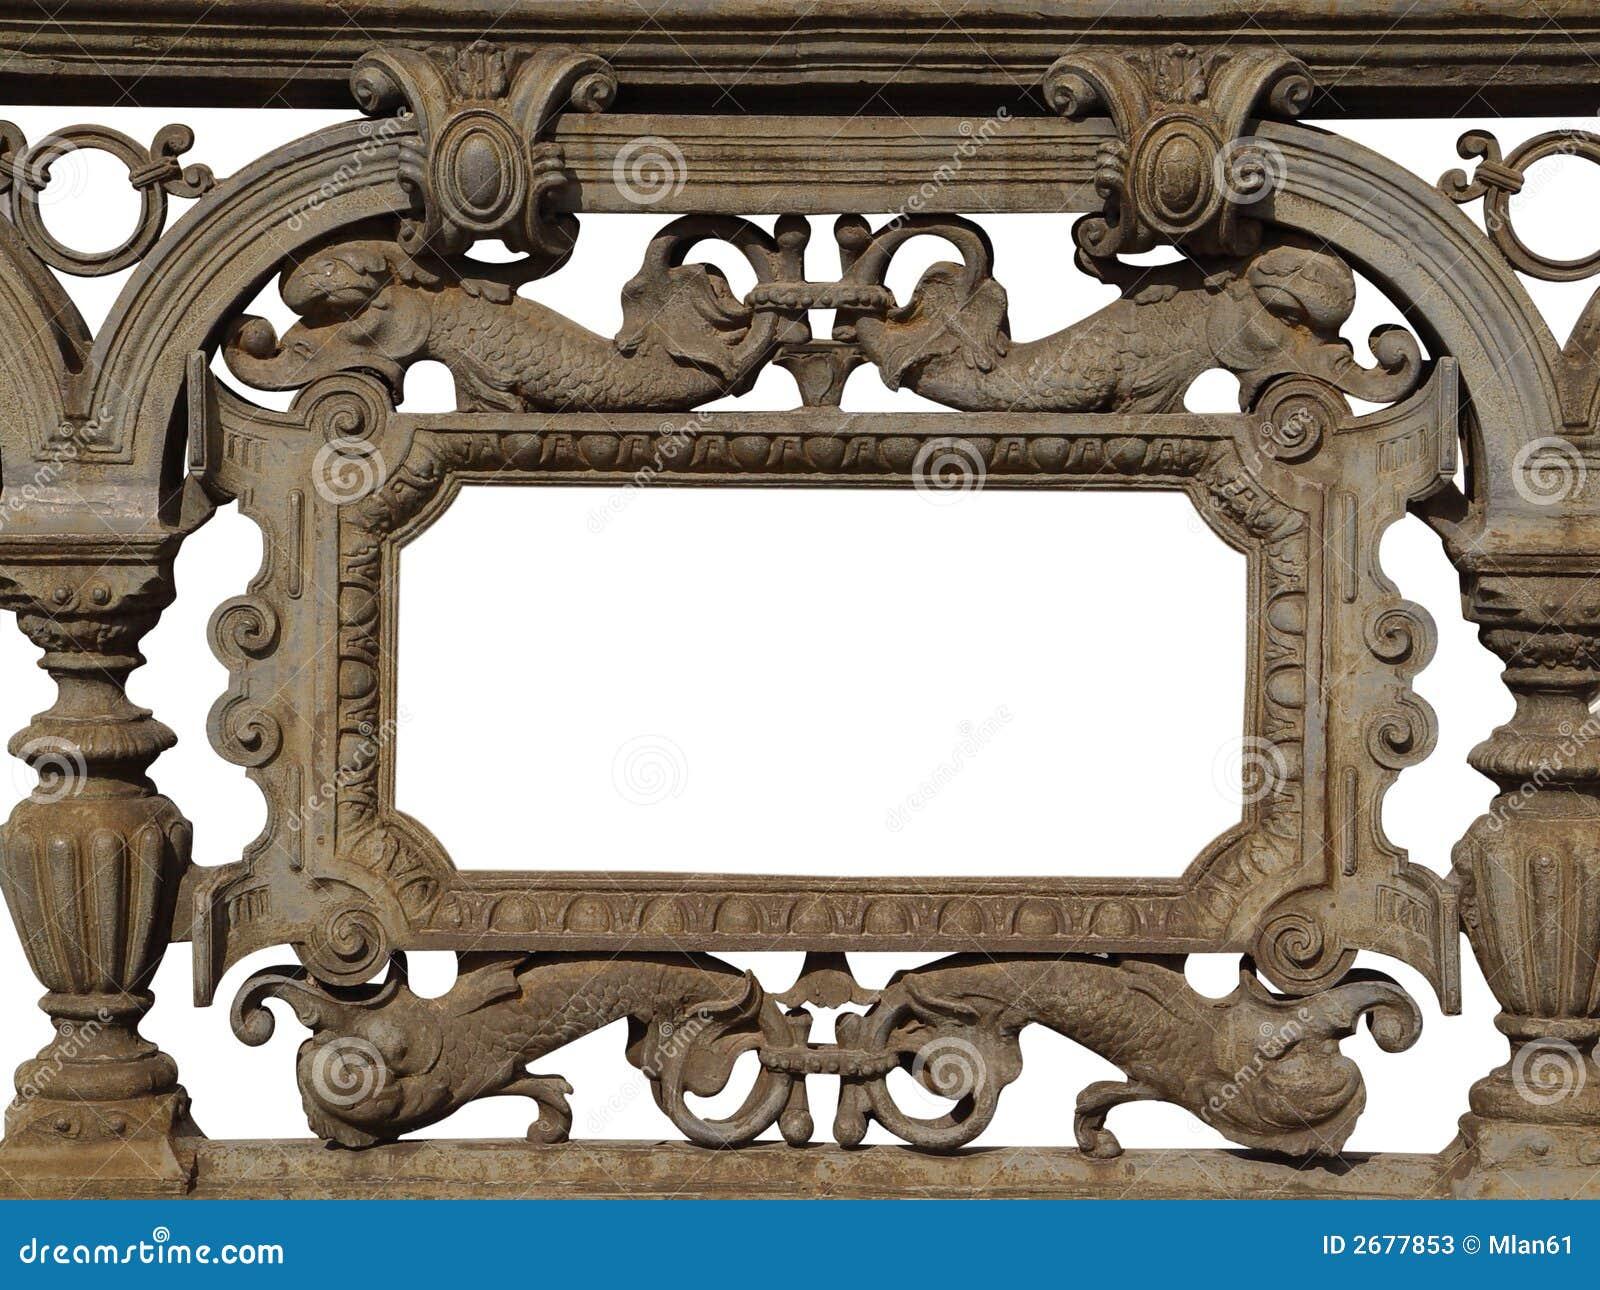 Baroque cast iron frame stock image. Image of decoration - 2677853